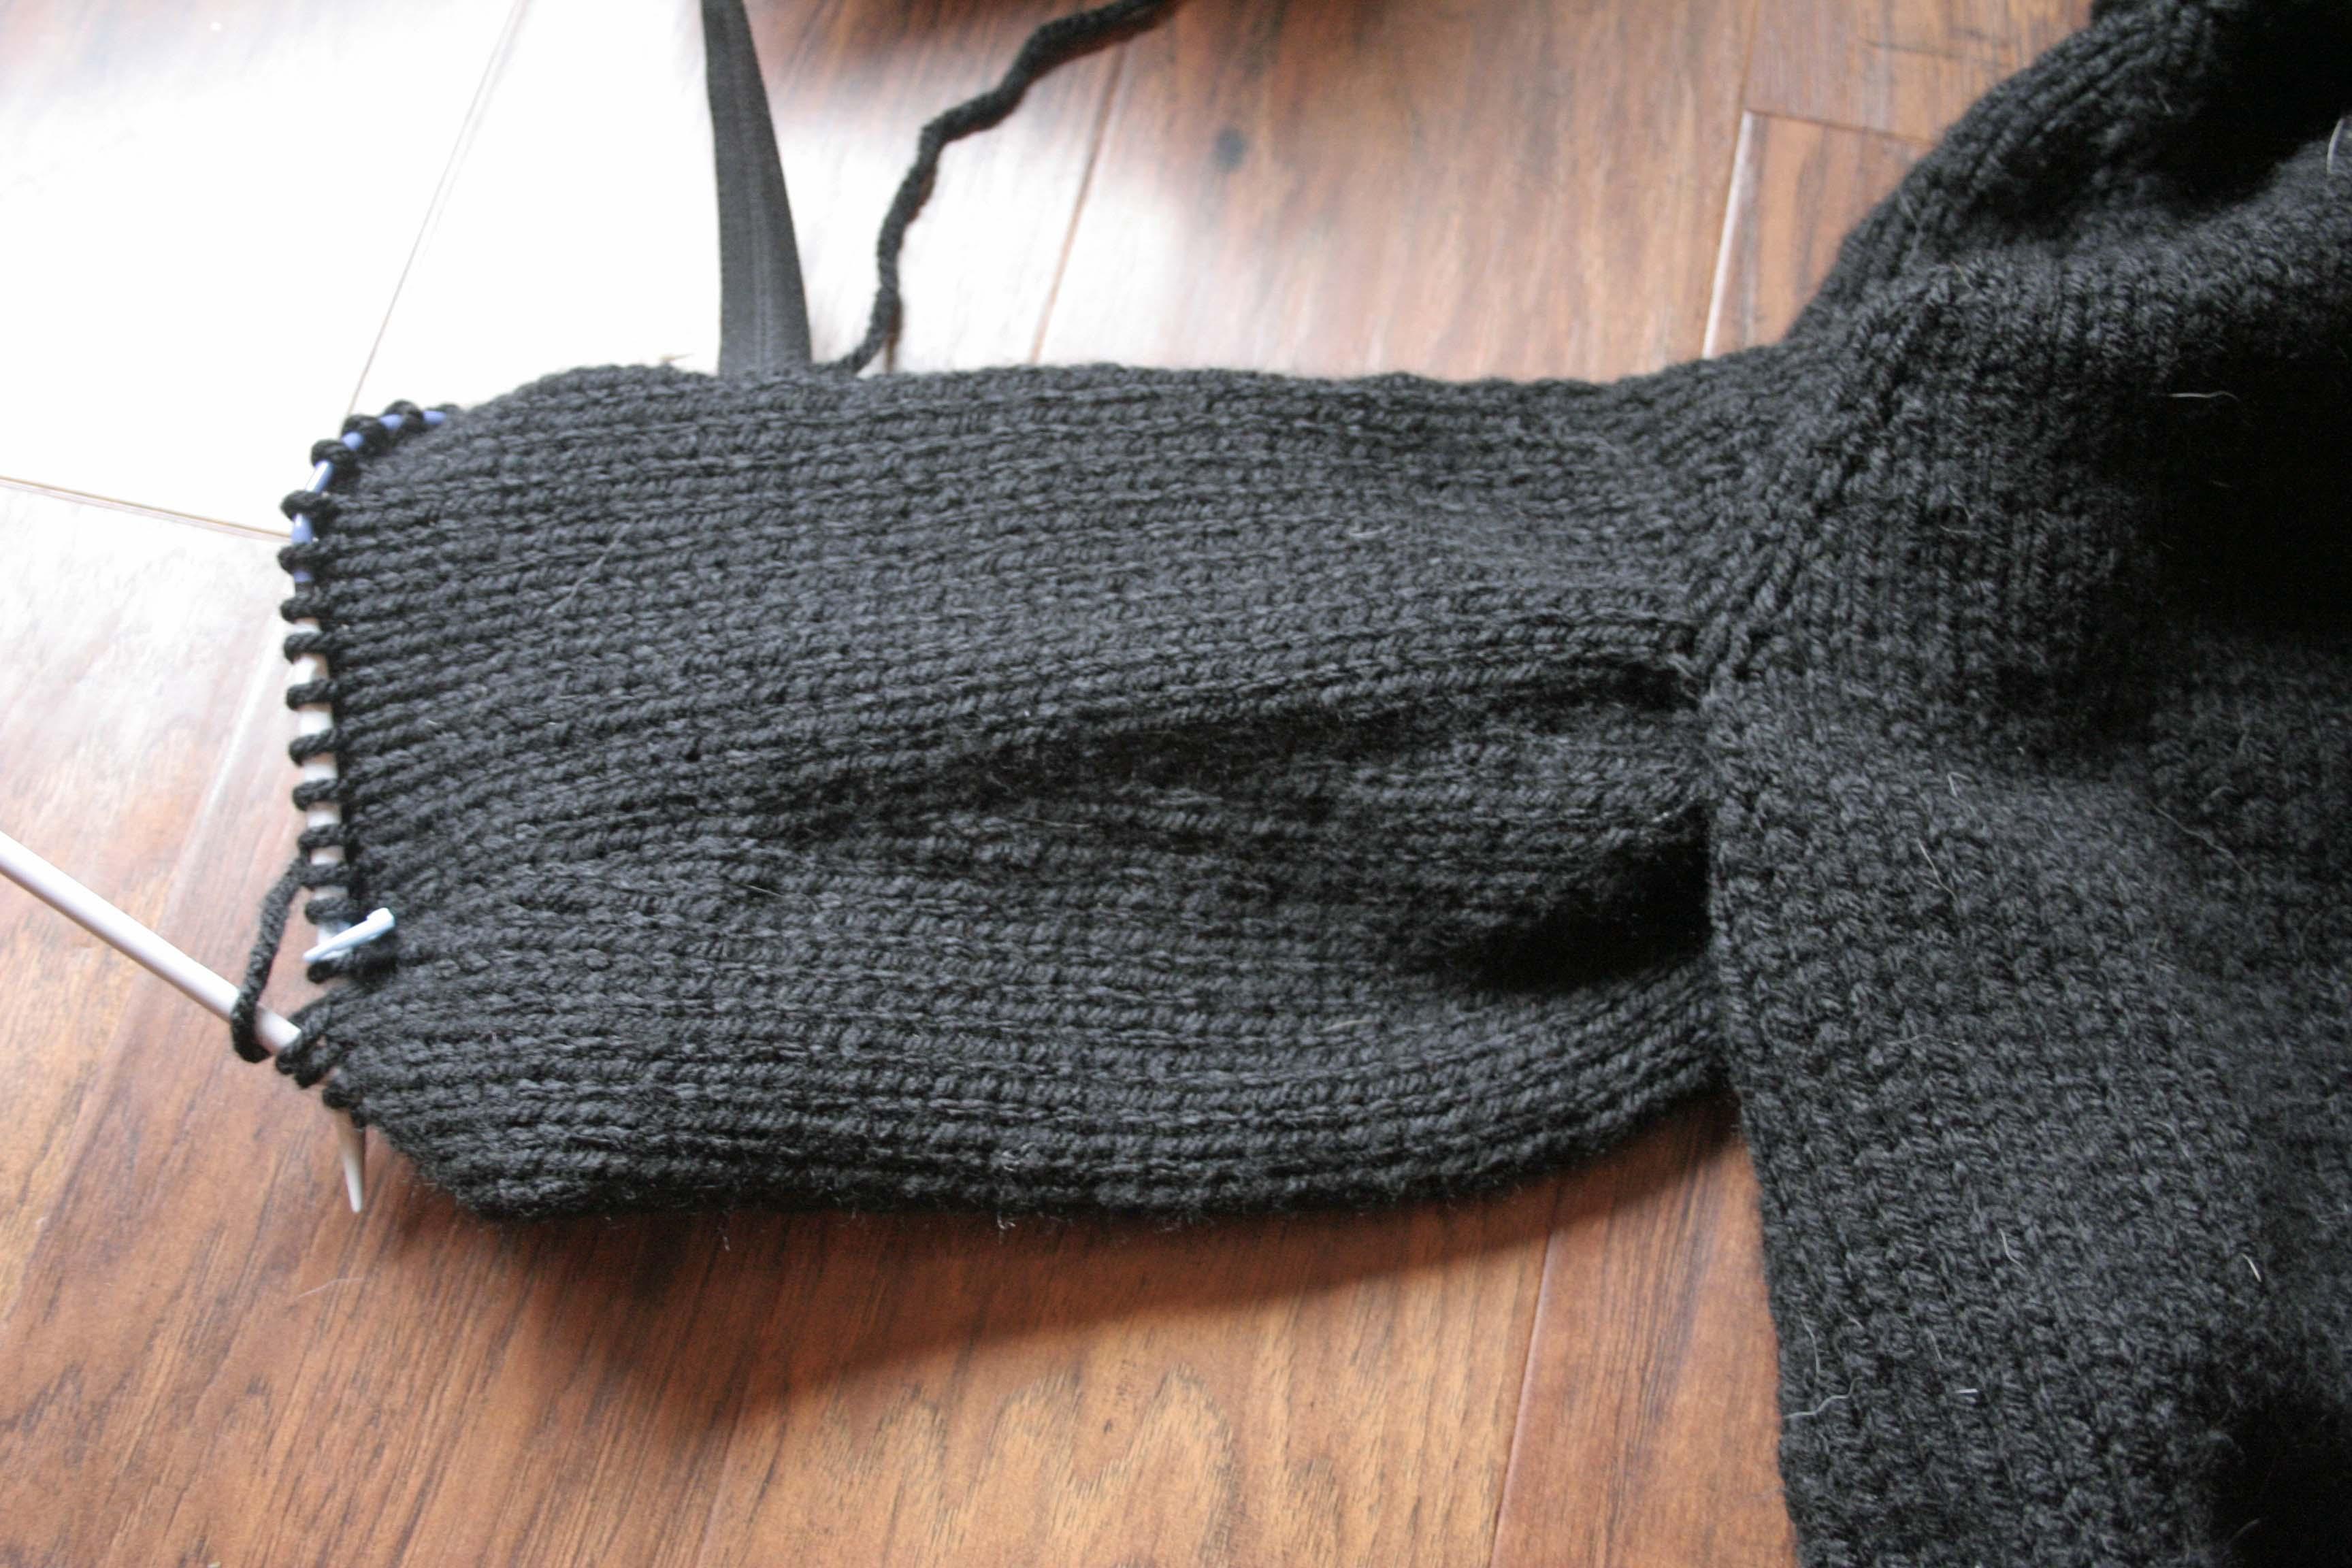 Knitting Yrn K2tog : K tog my tangled yarn knitting adventures